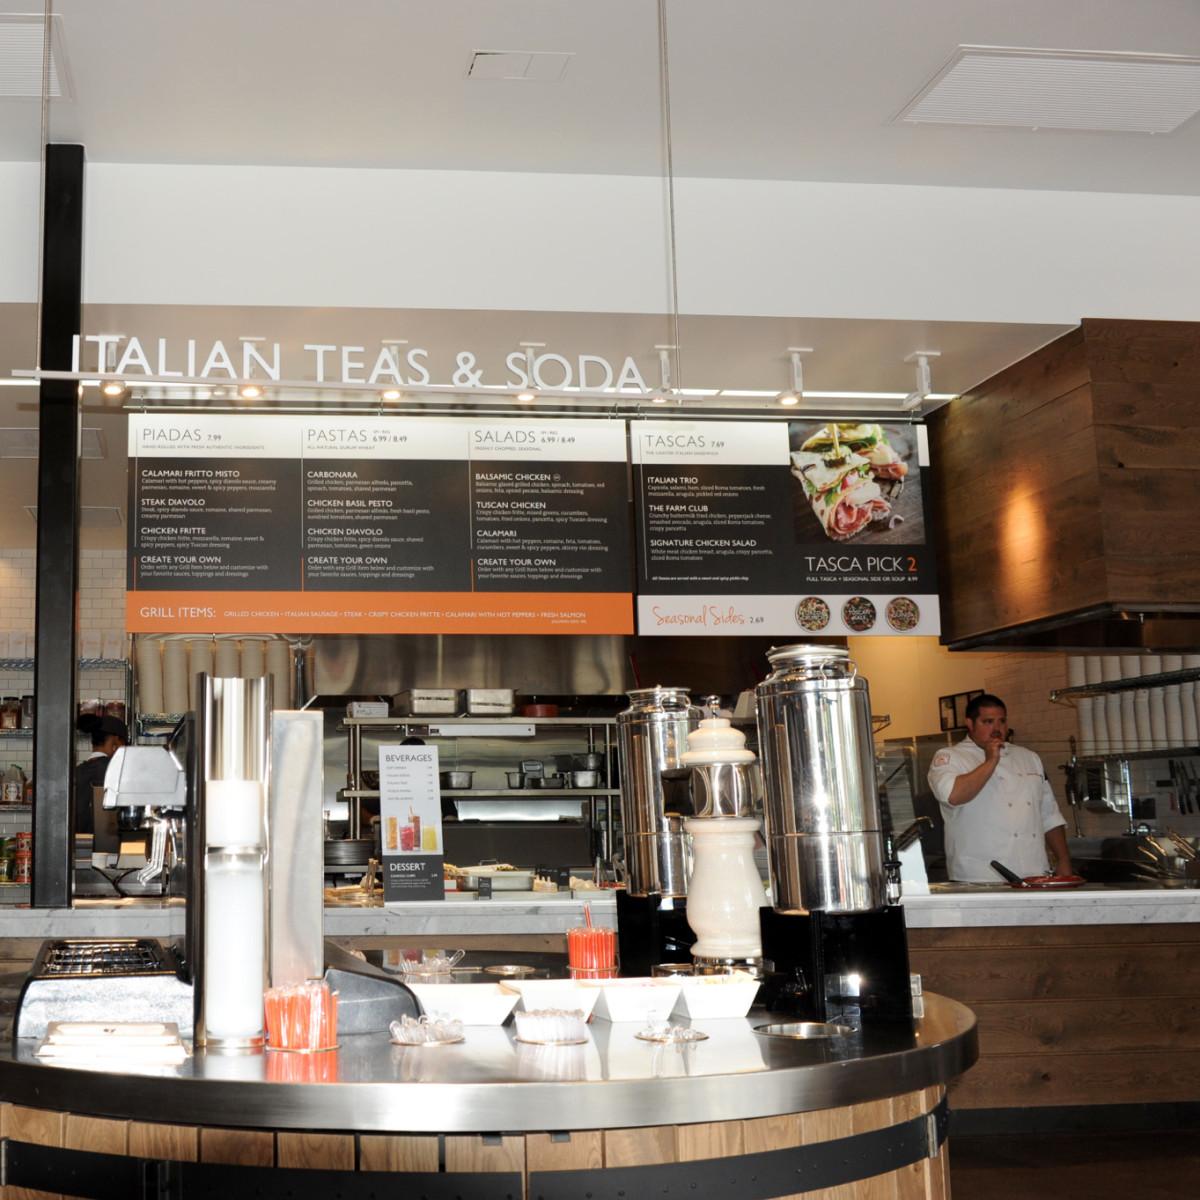 Piada Italian street food interior